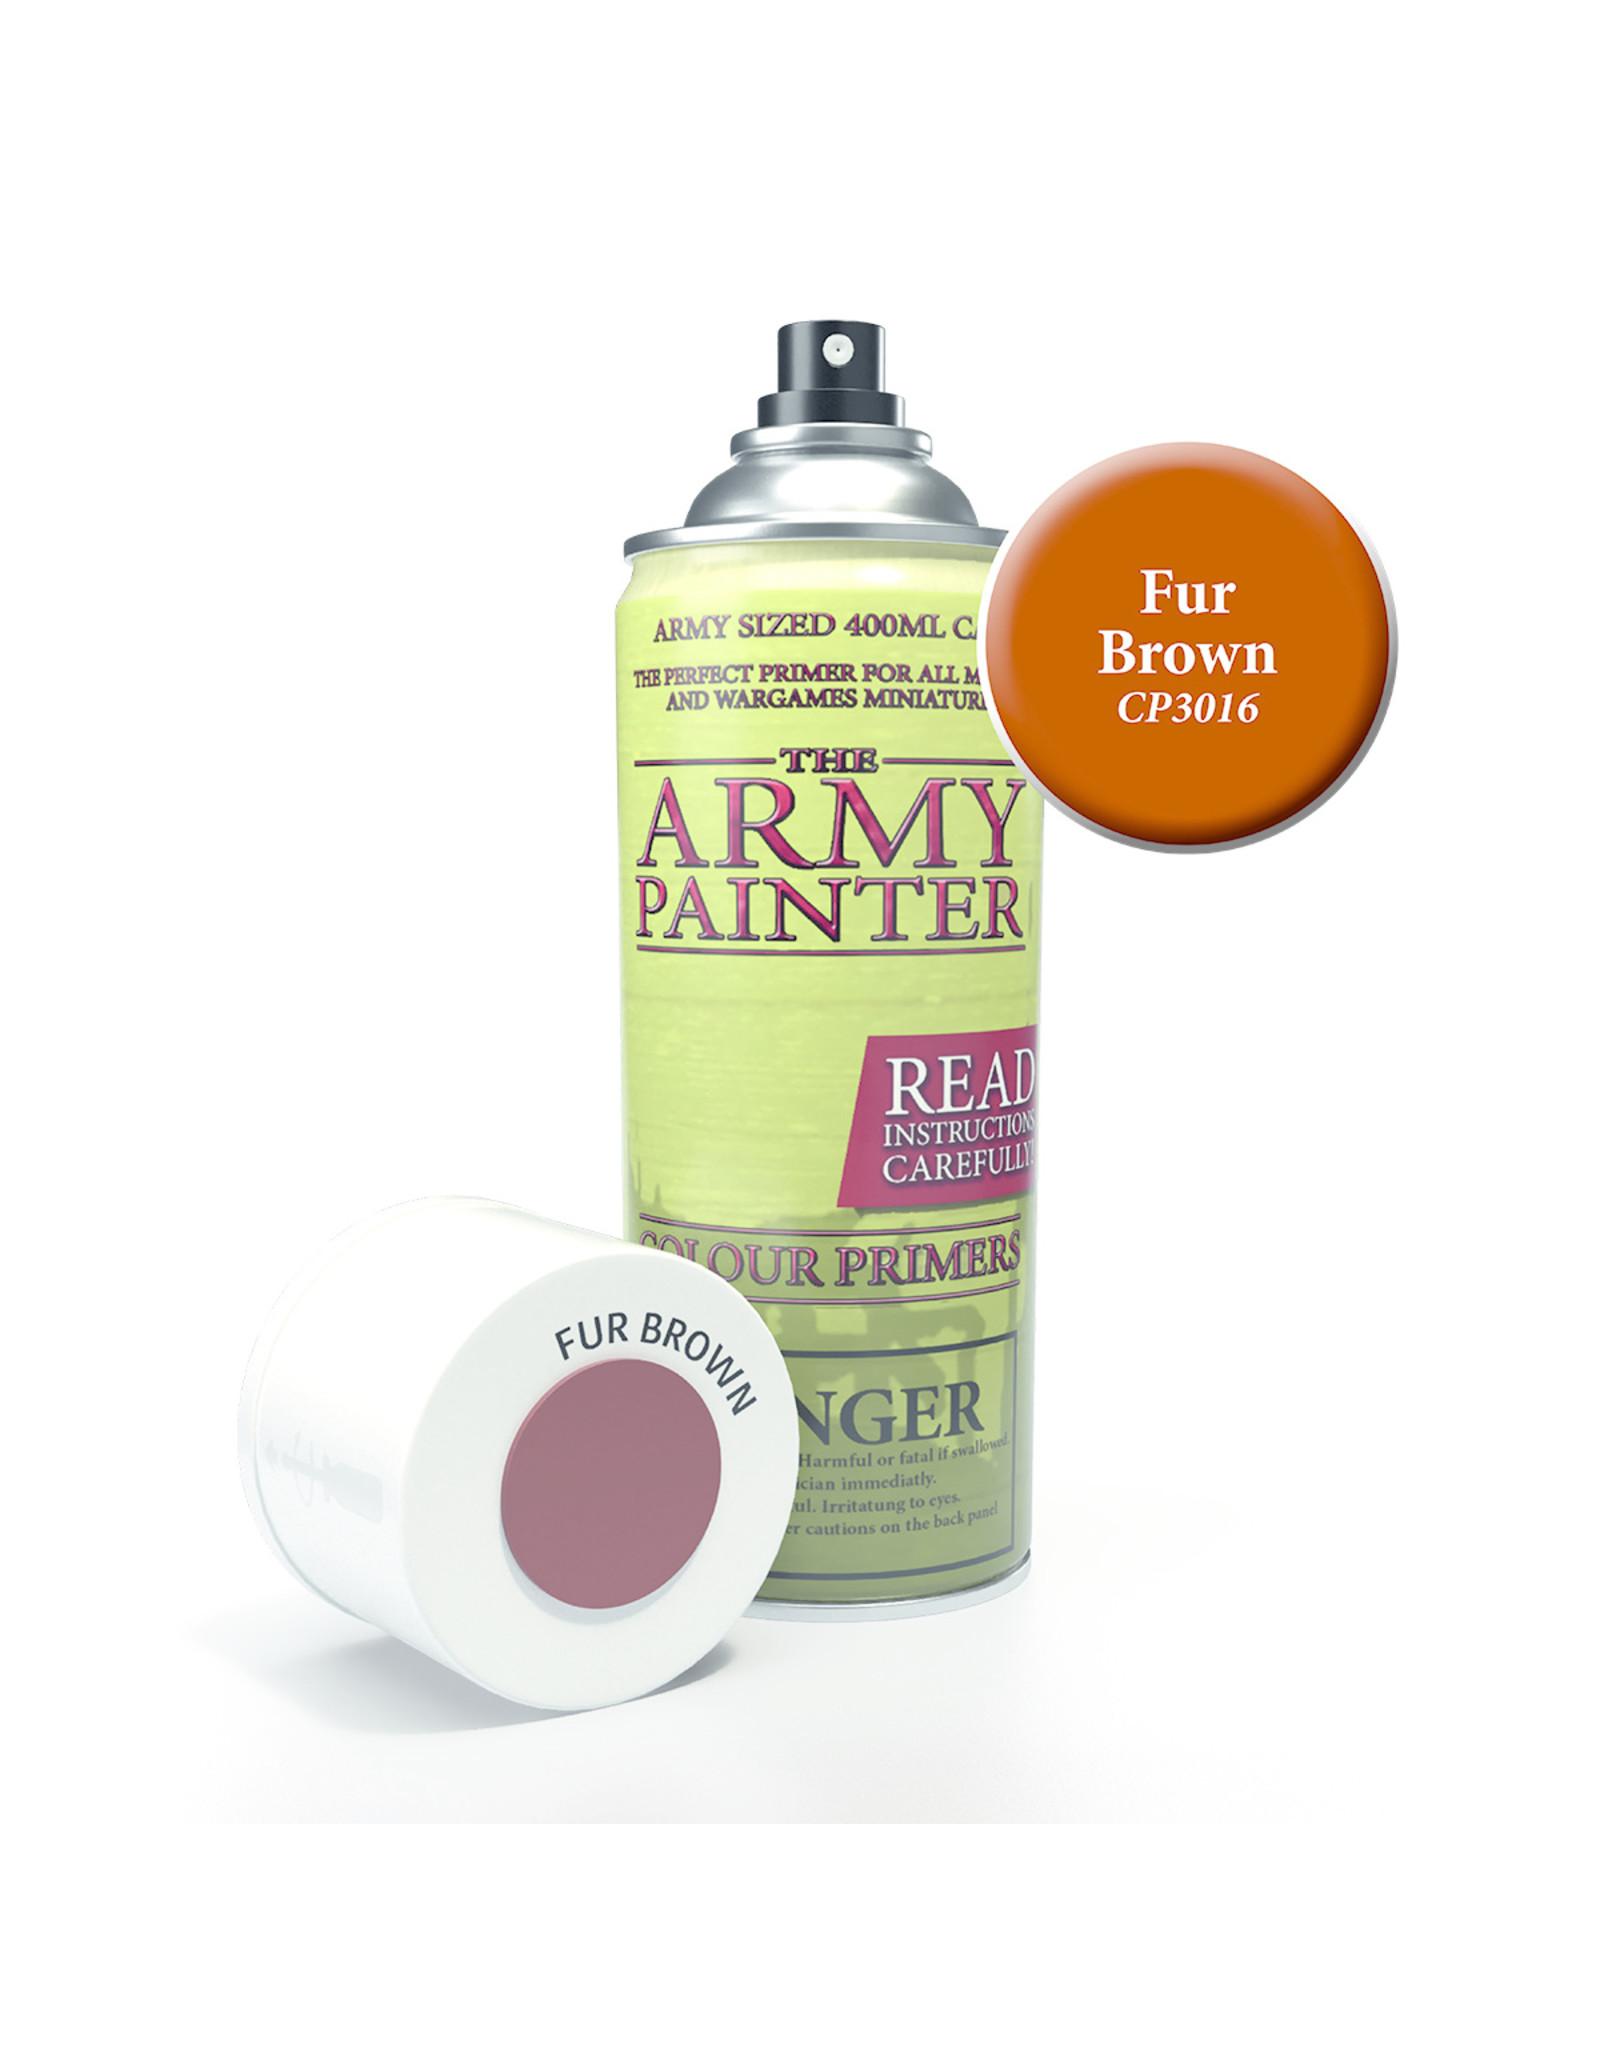 Army Painter TAP Primer - Fur Brown Spray